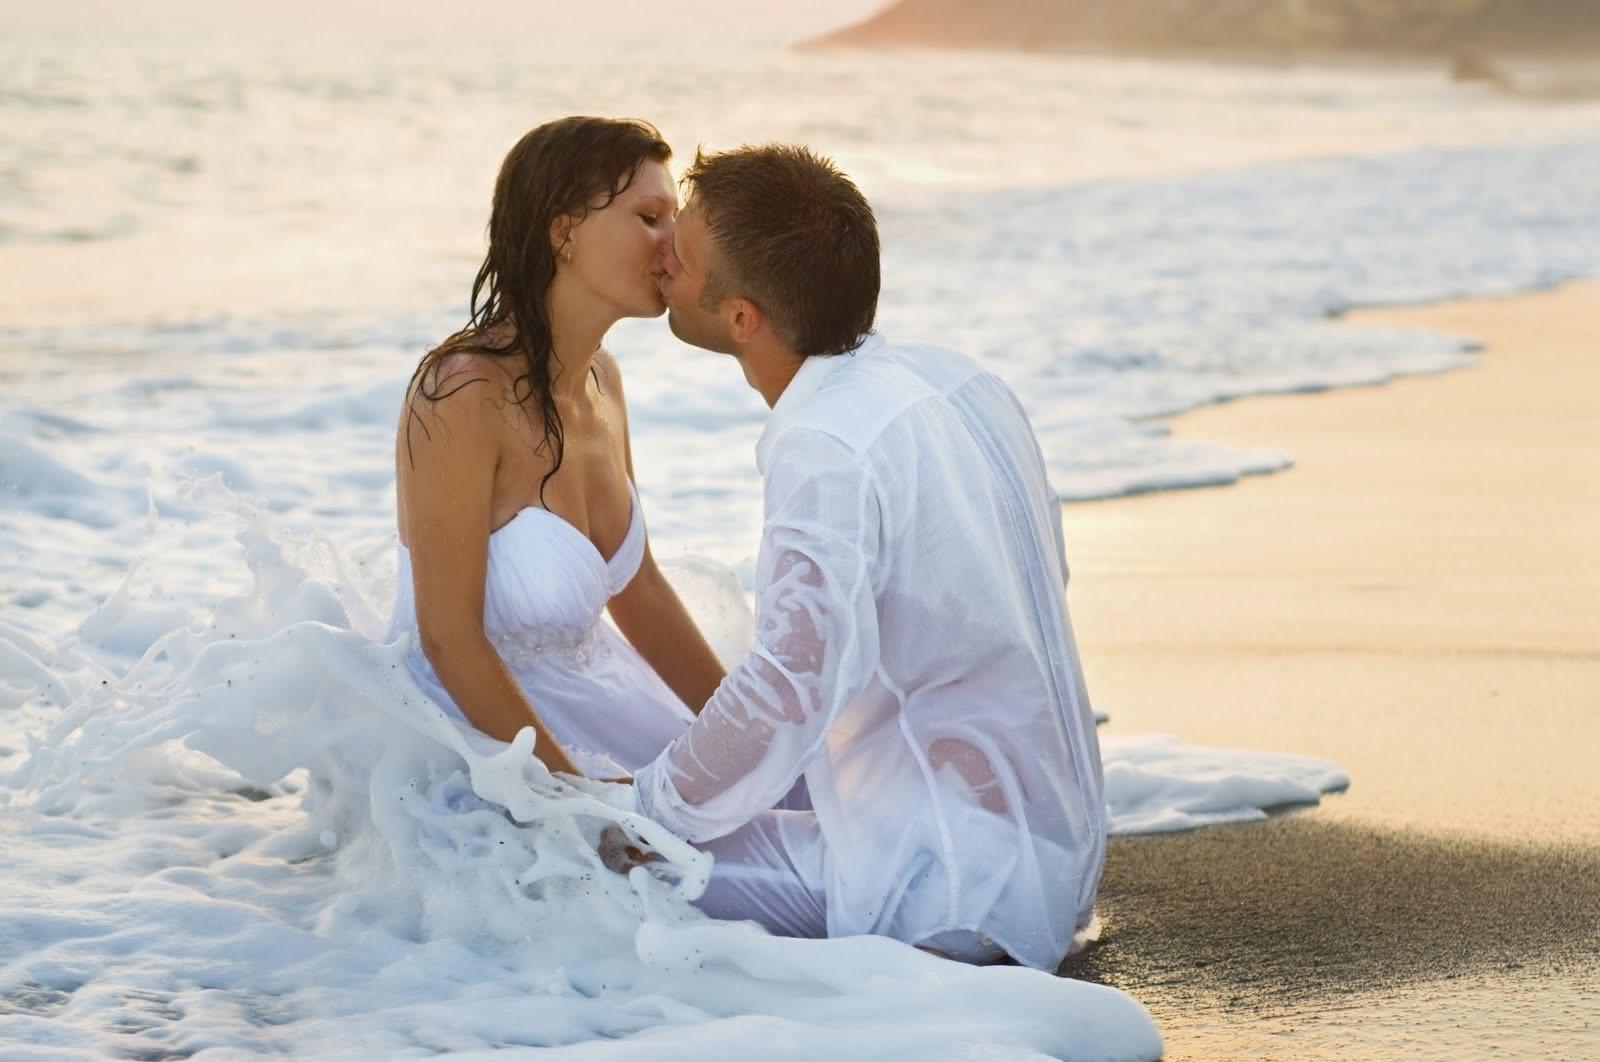 1372077564_kissing_couple_wallpaper